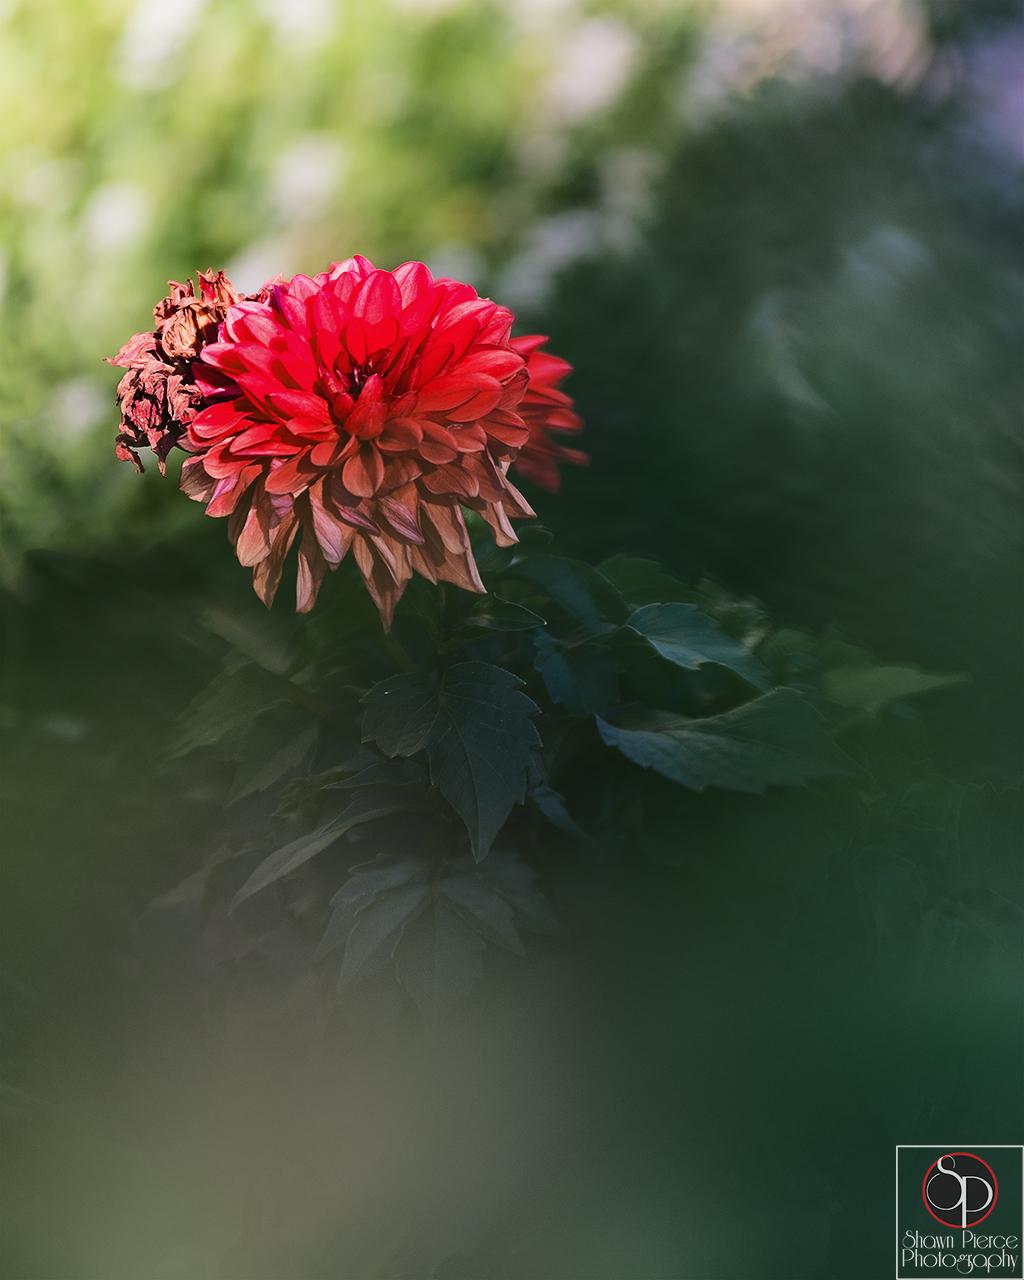 SPP_7520 2 fb.jpg